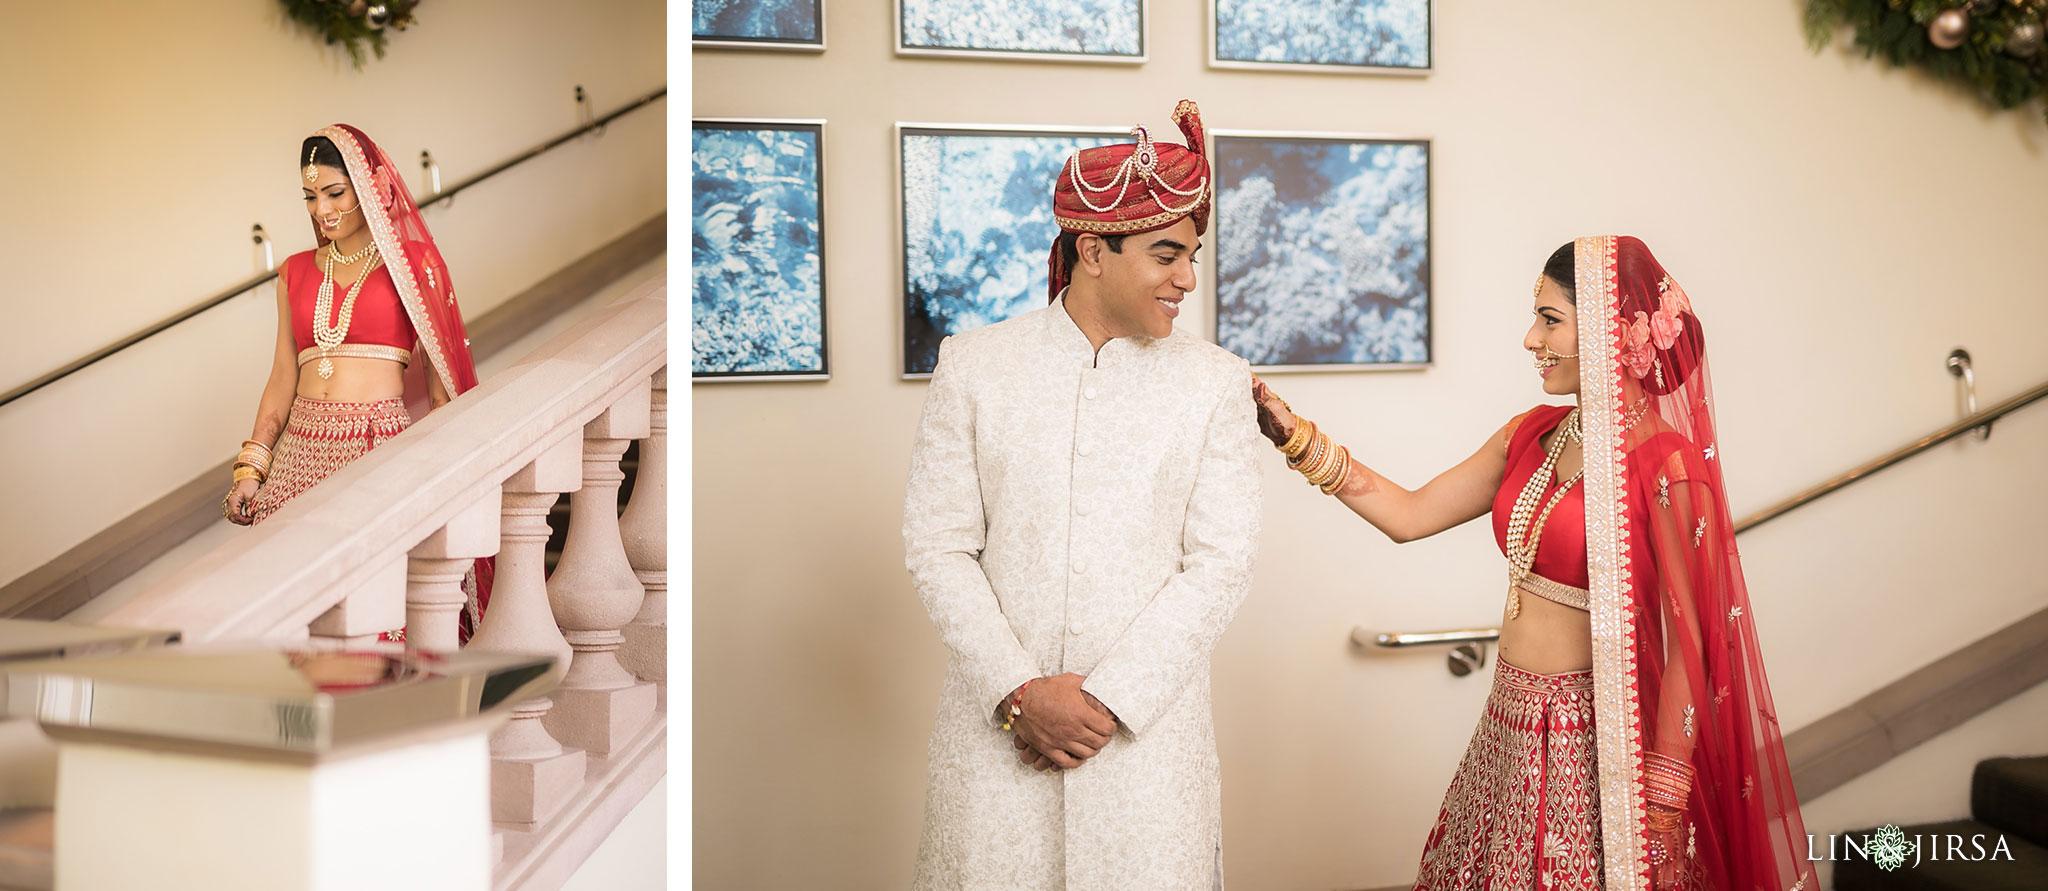 15 ritz carlton laguna niguel first look indian wedding photography